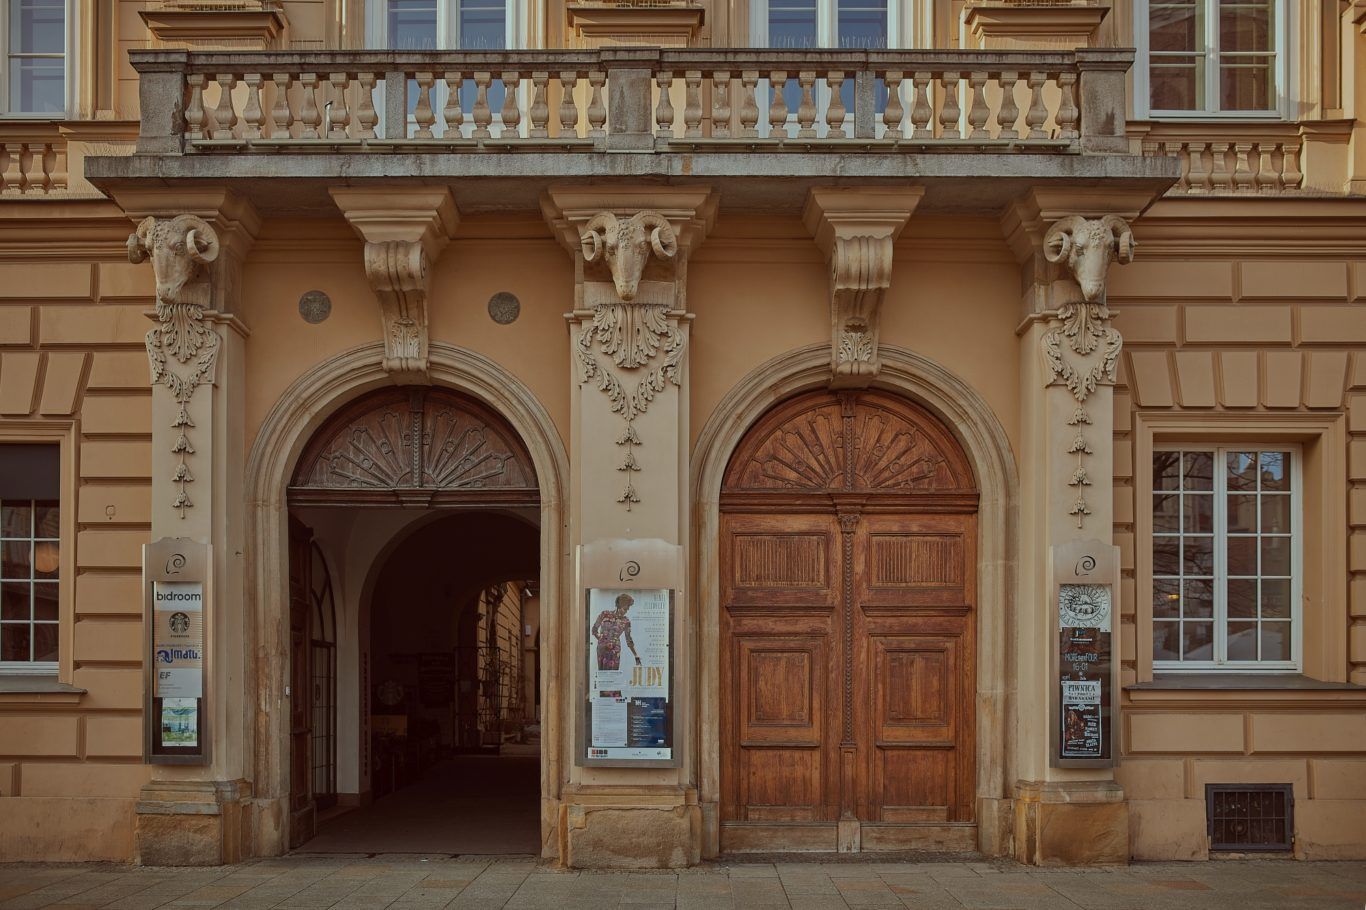 Pałac i Piwnica pod Baranami